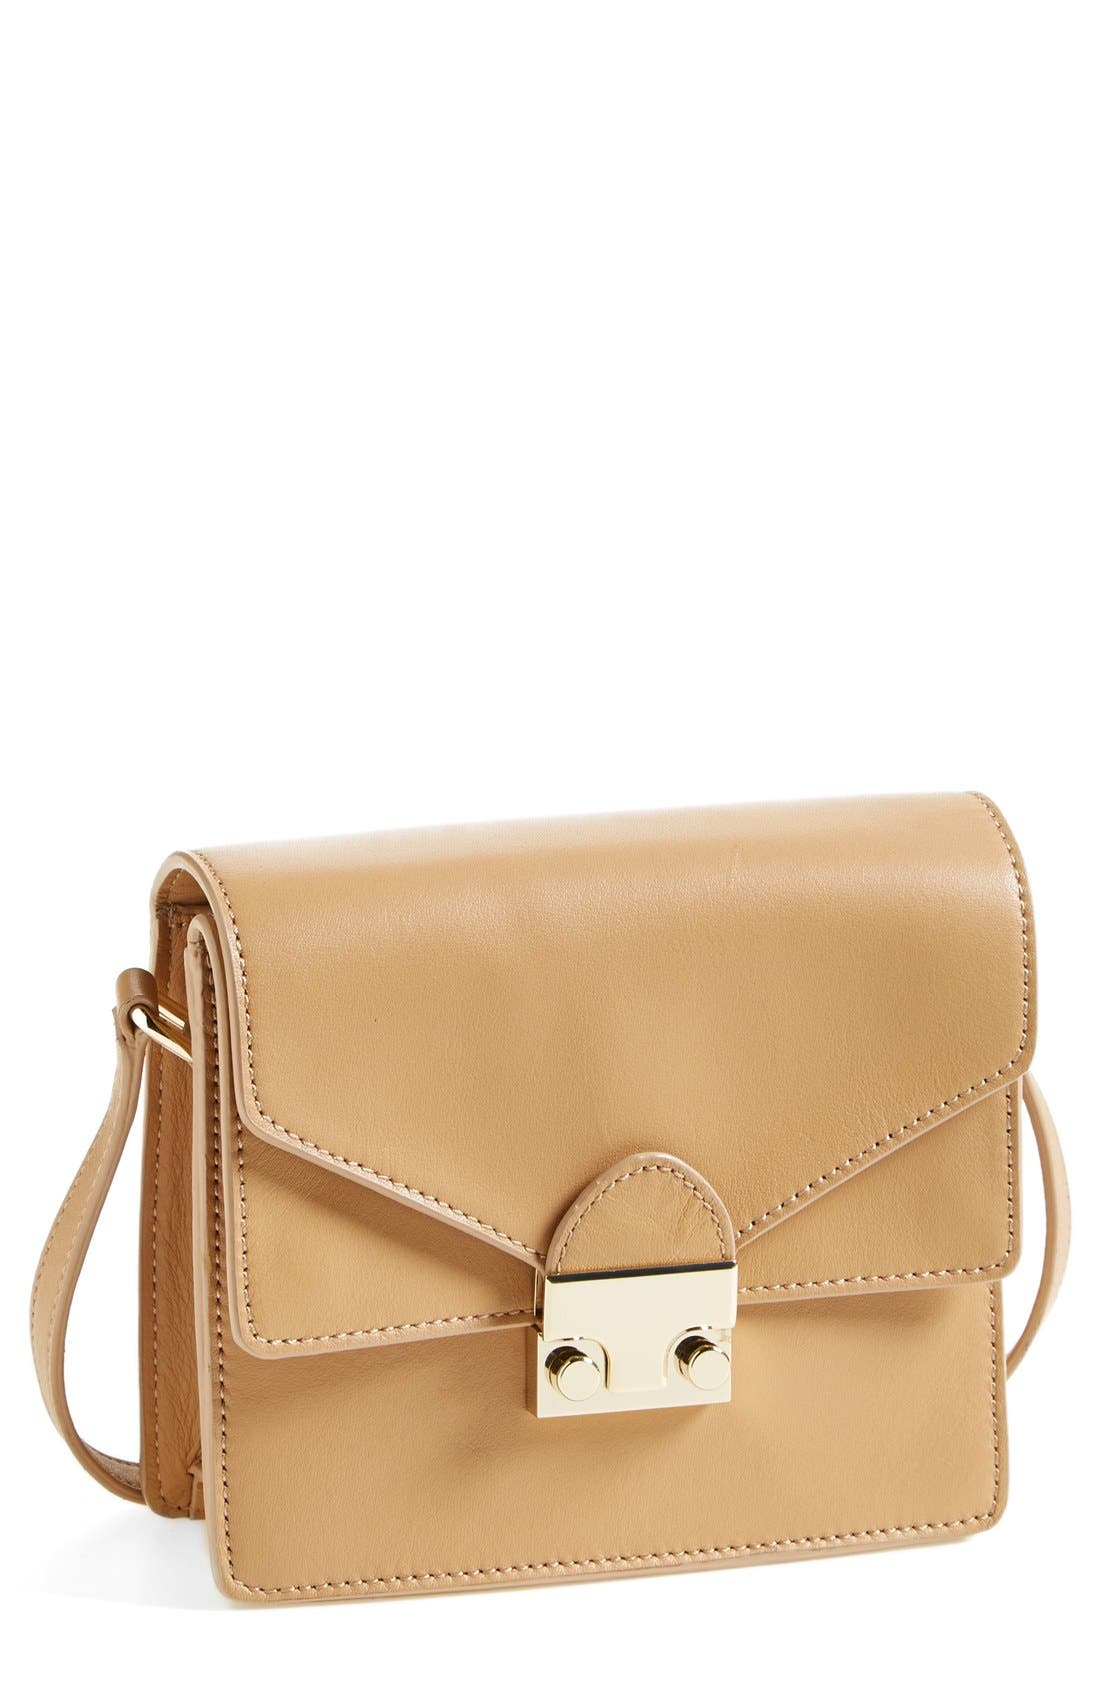 Main Image - Loeffler Randall 'Mini Agenda' Crossbody Bag